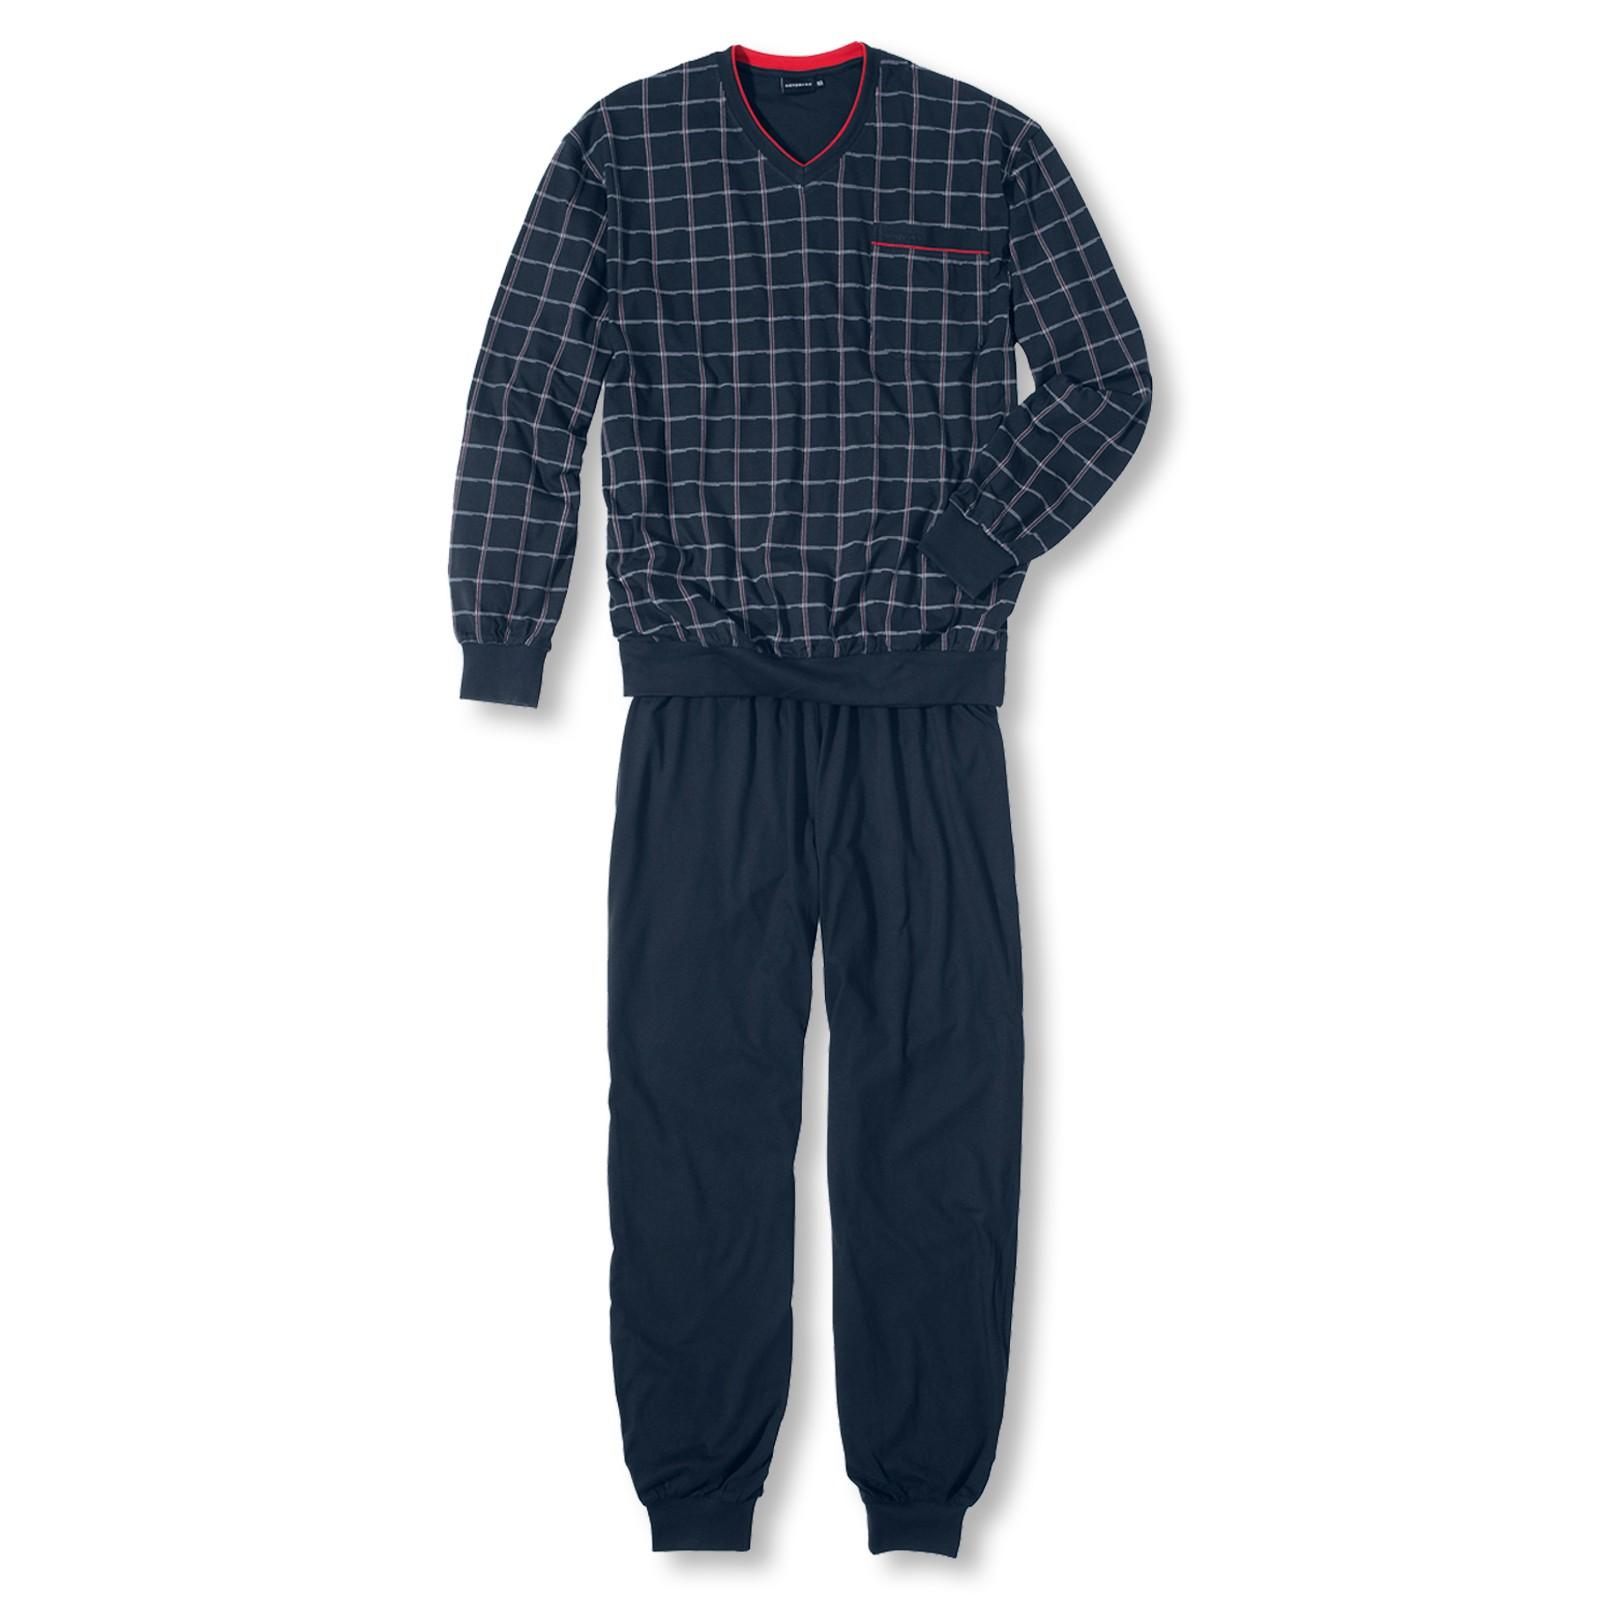 Götzburg Herren Pyjama langarm Antonio 451156 S M L XL XXL 3XL in navy